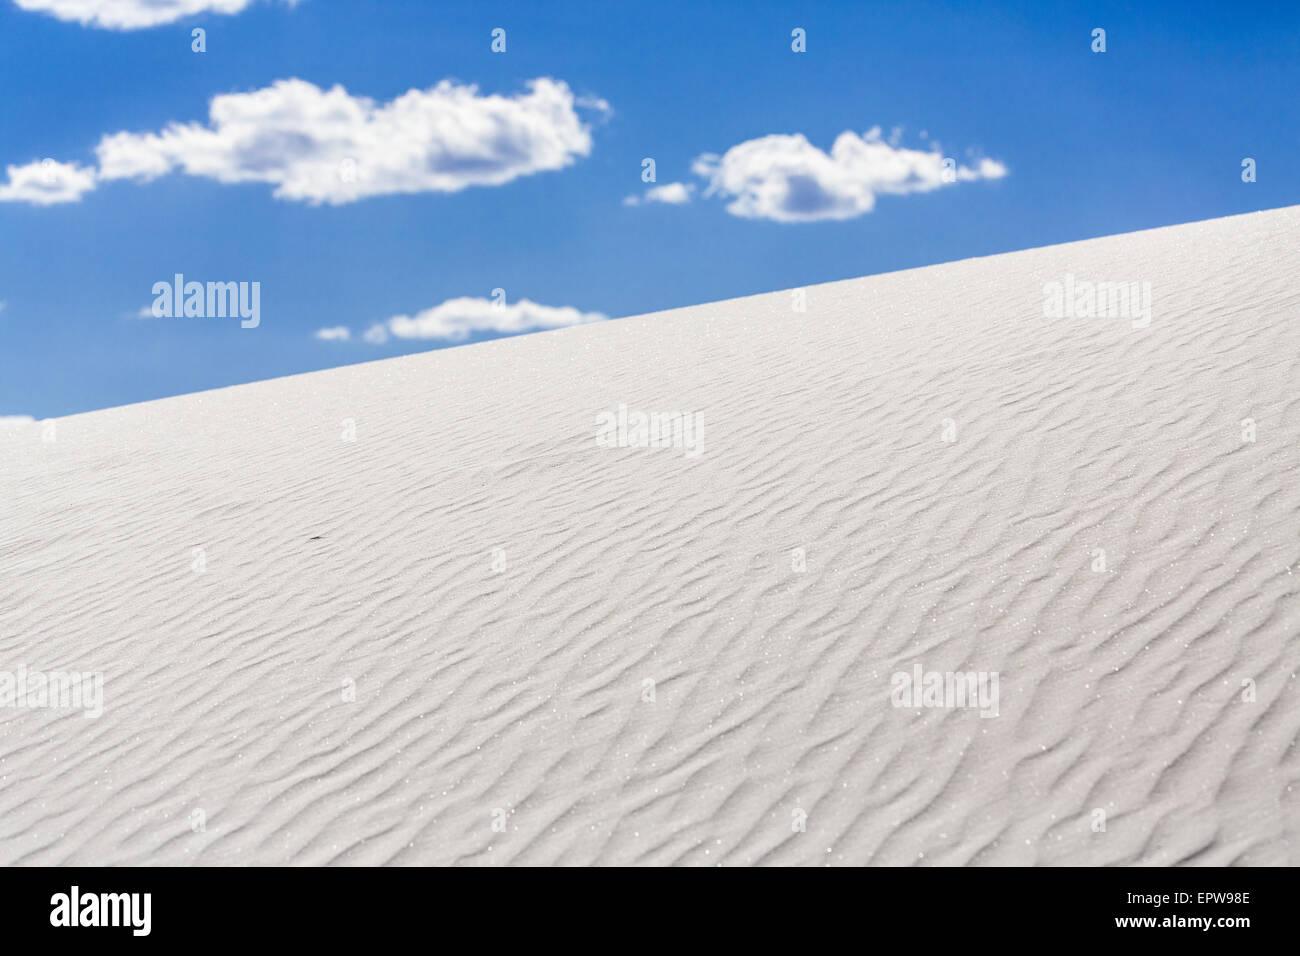 Sand dune, White Sands National Monument, Alamogordo, New Mexico, USA - Stock Image